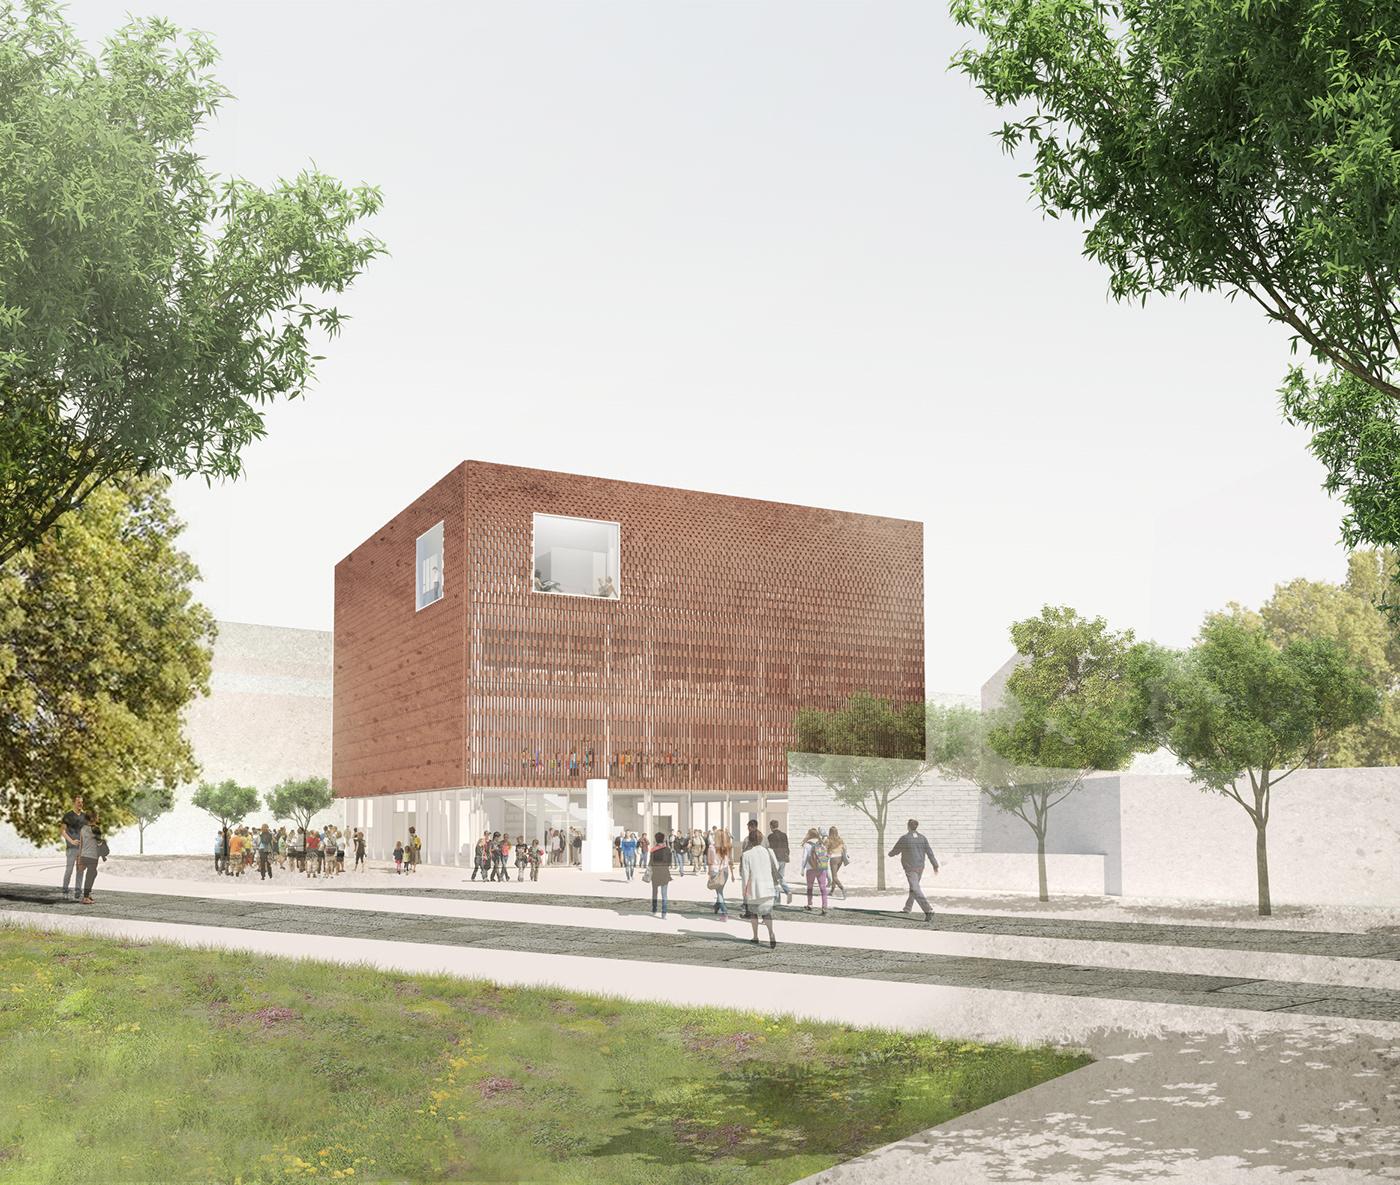 architecture brick CityCenter Events garden knowledgecenter library public exterior visualization